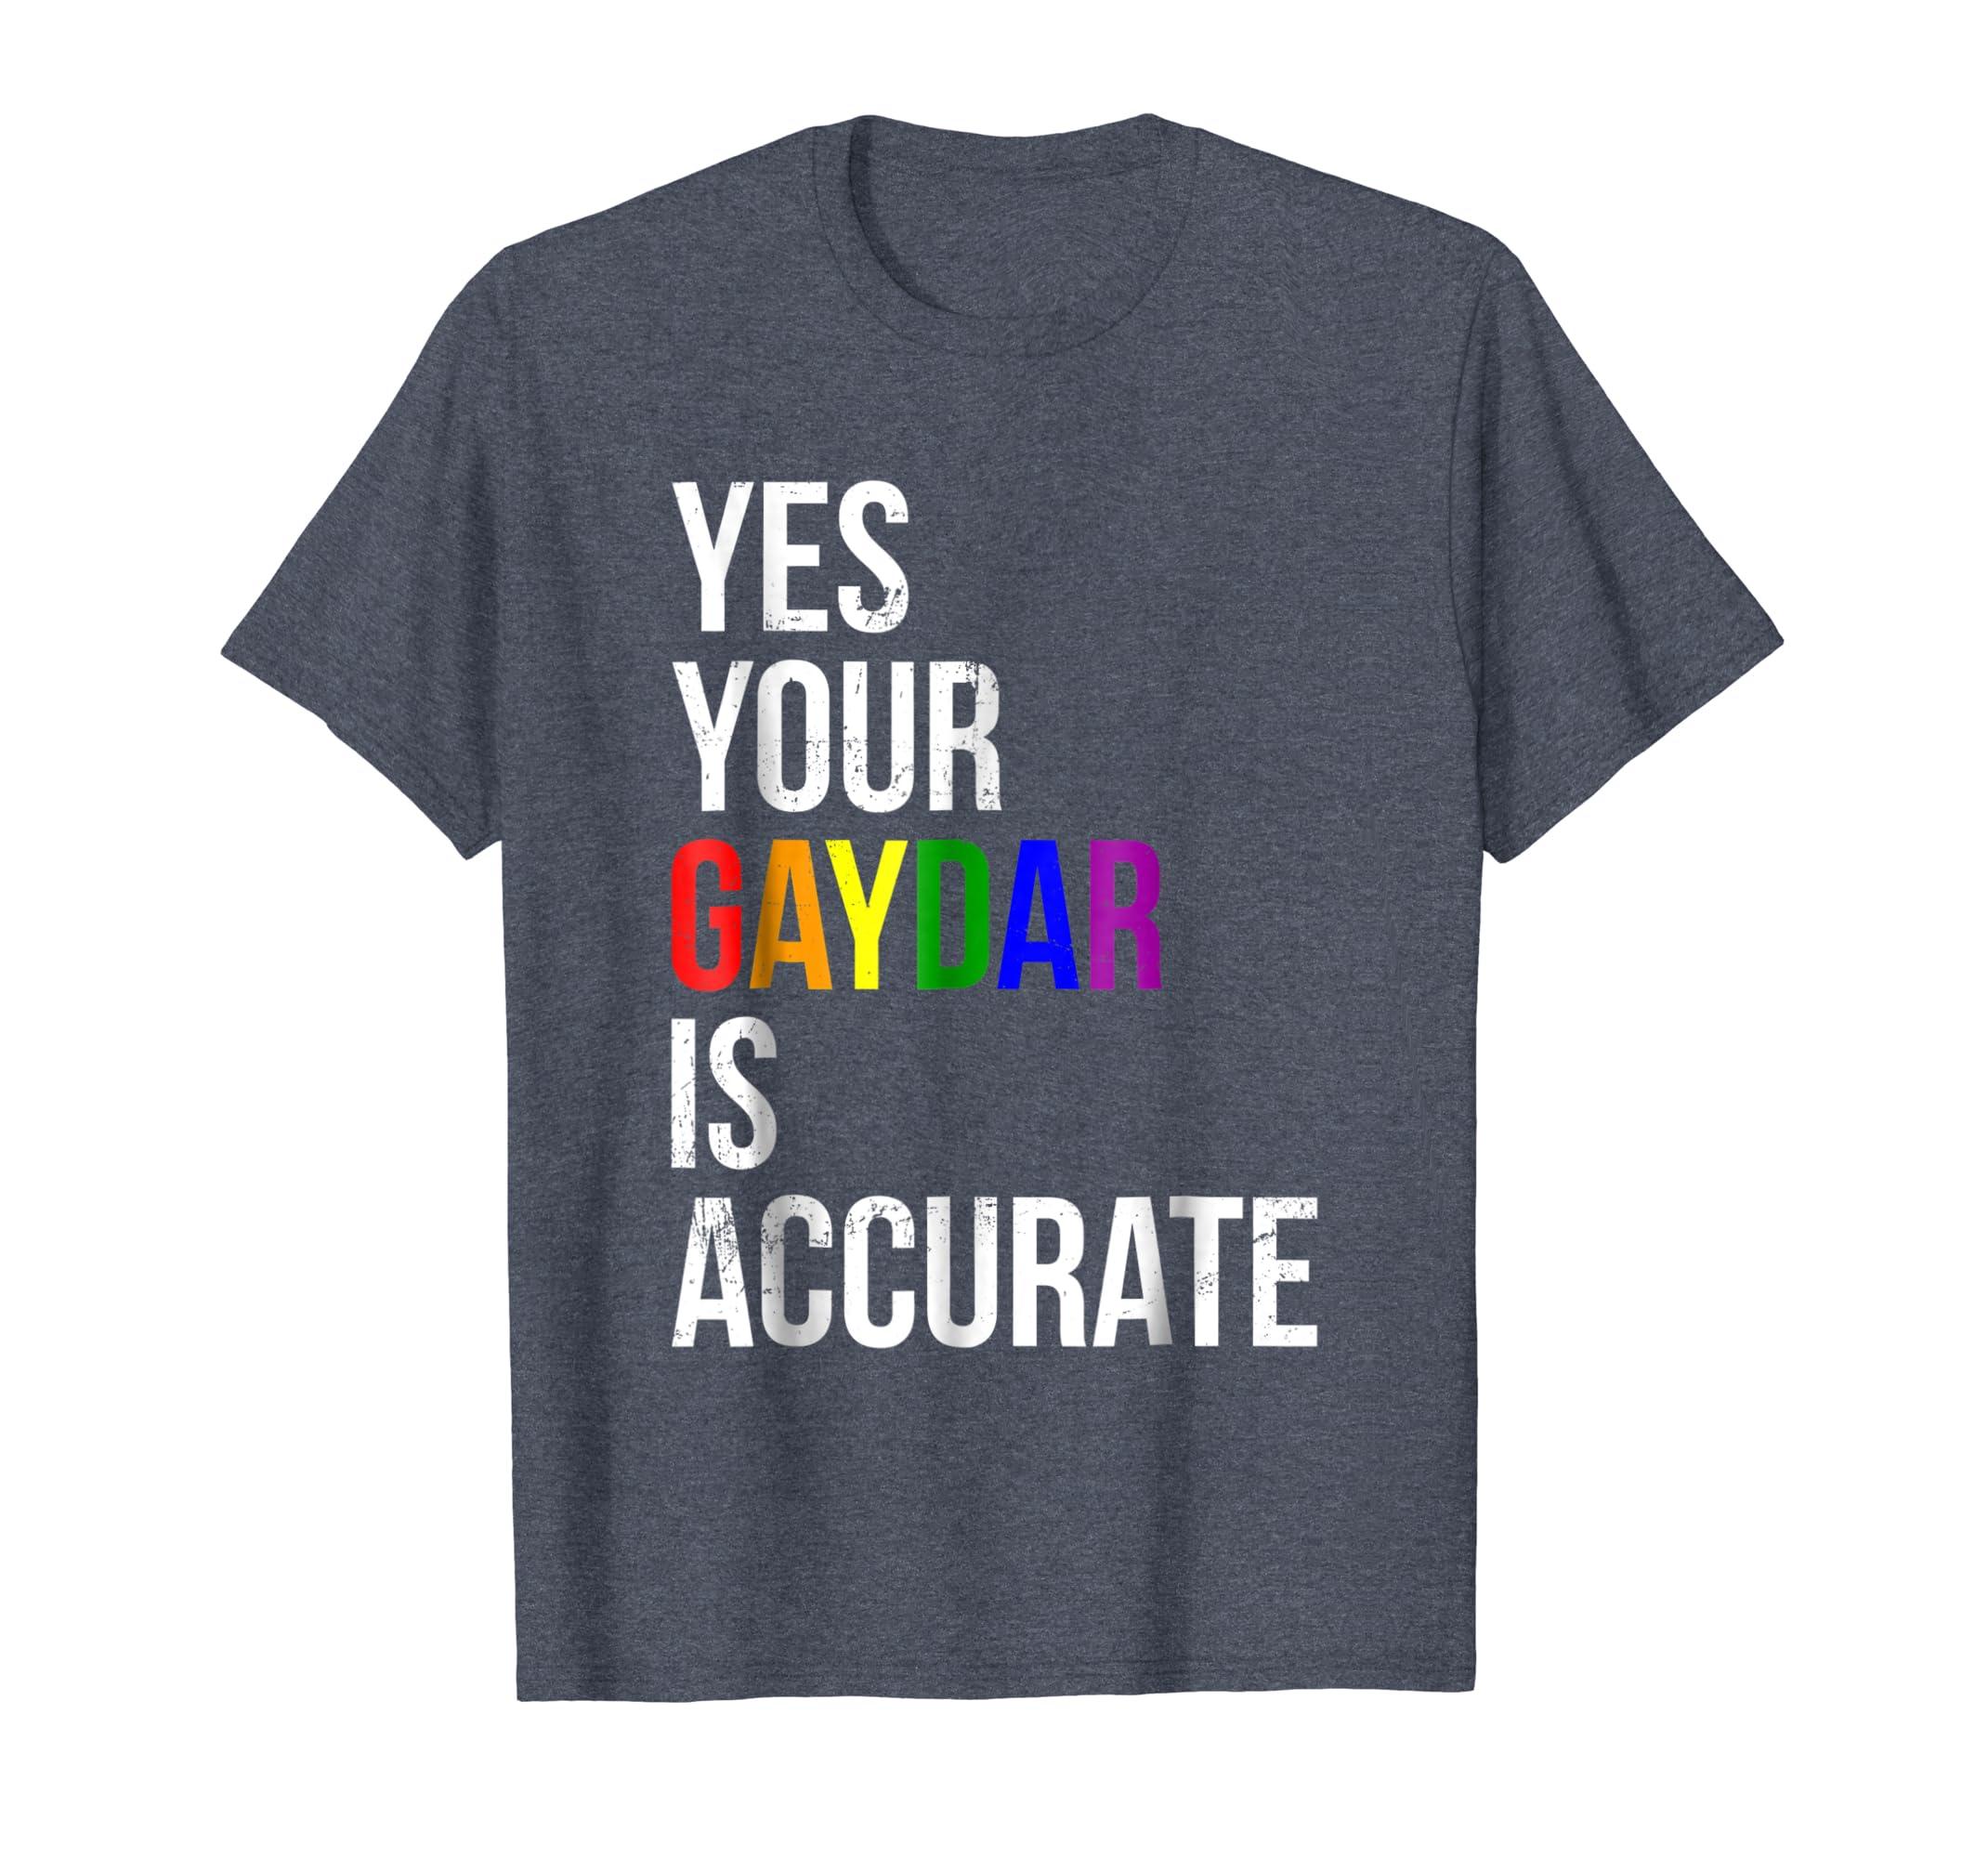 Gaydar online